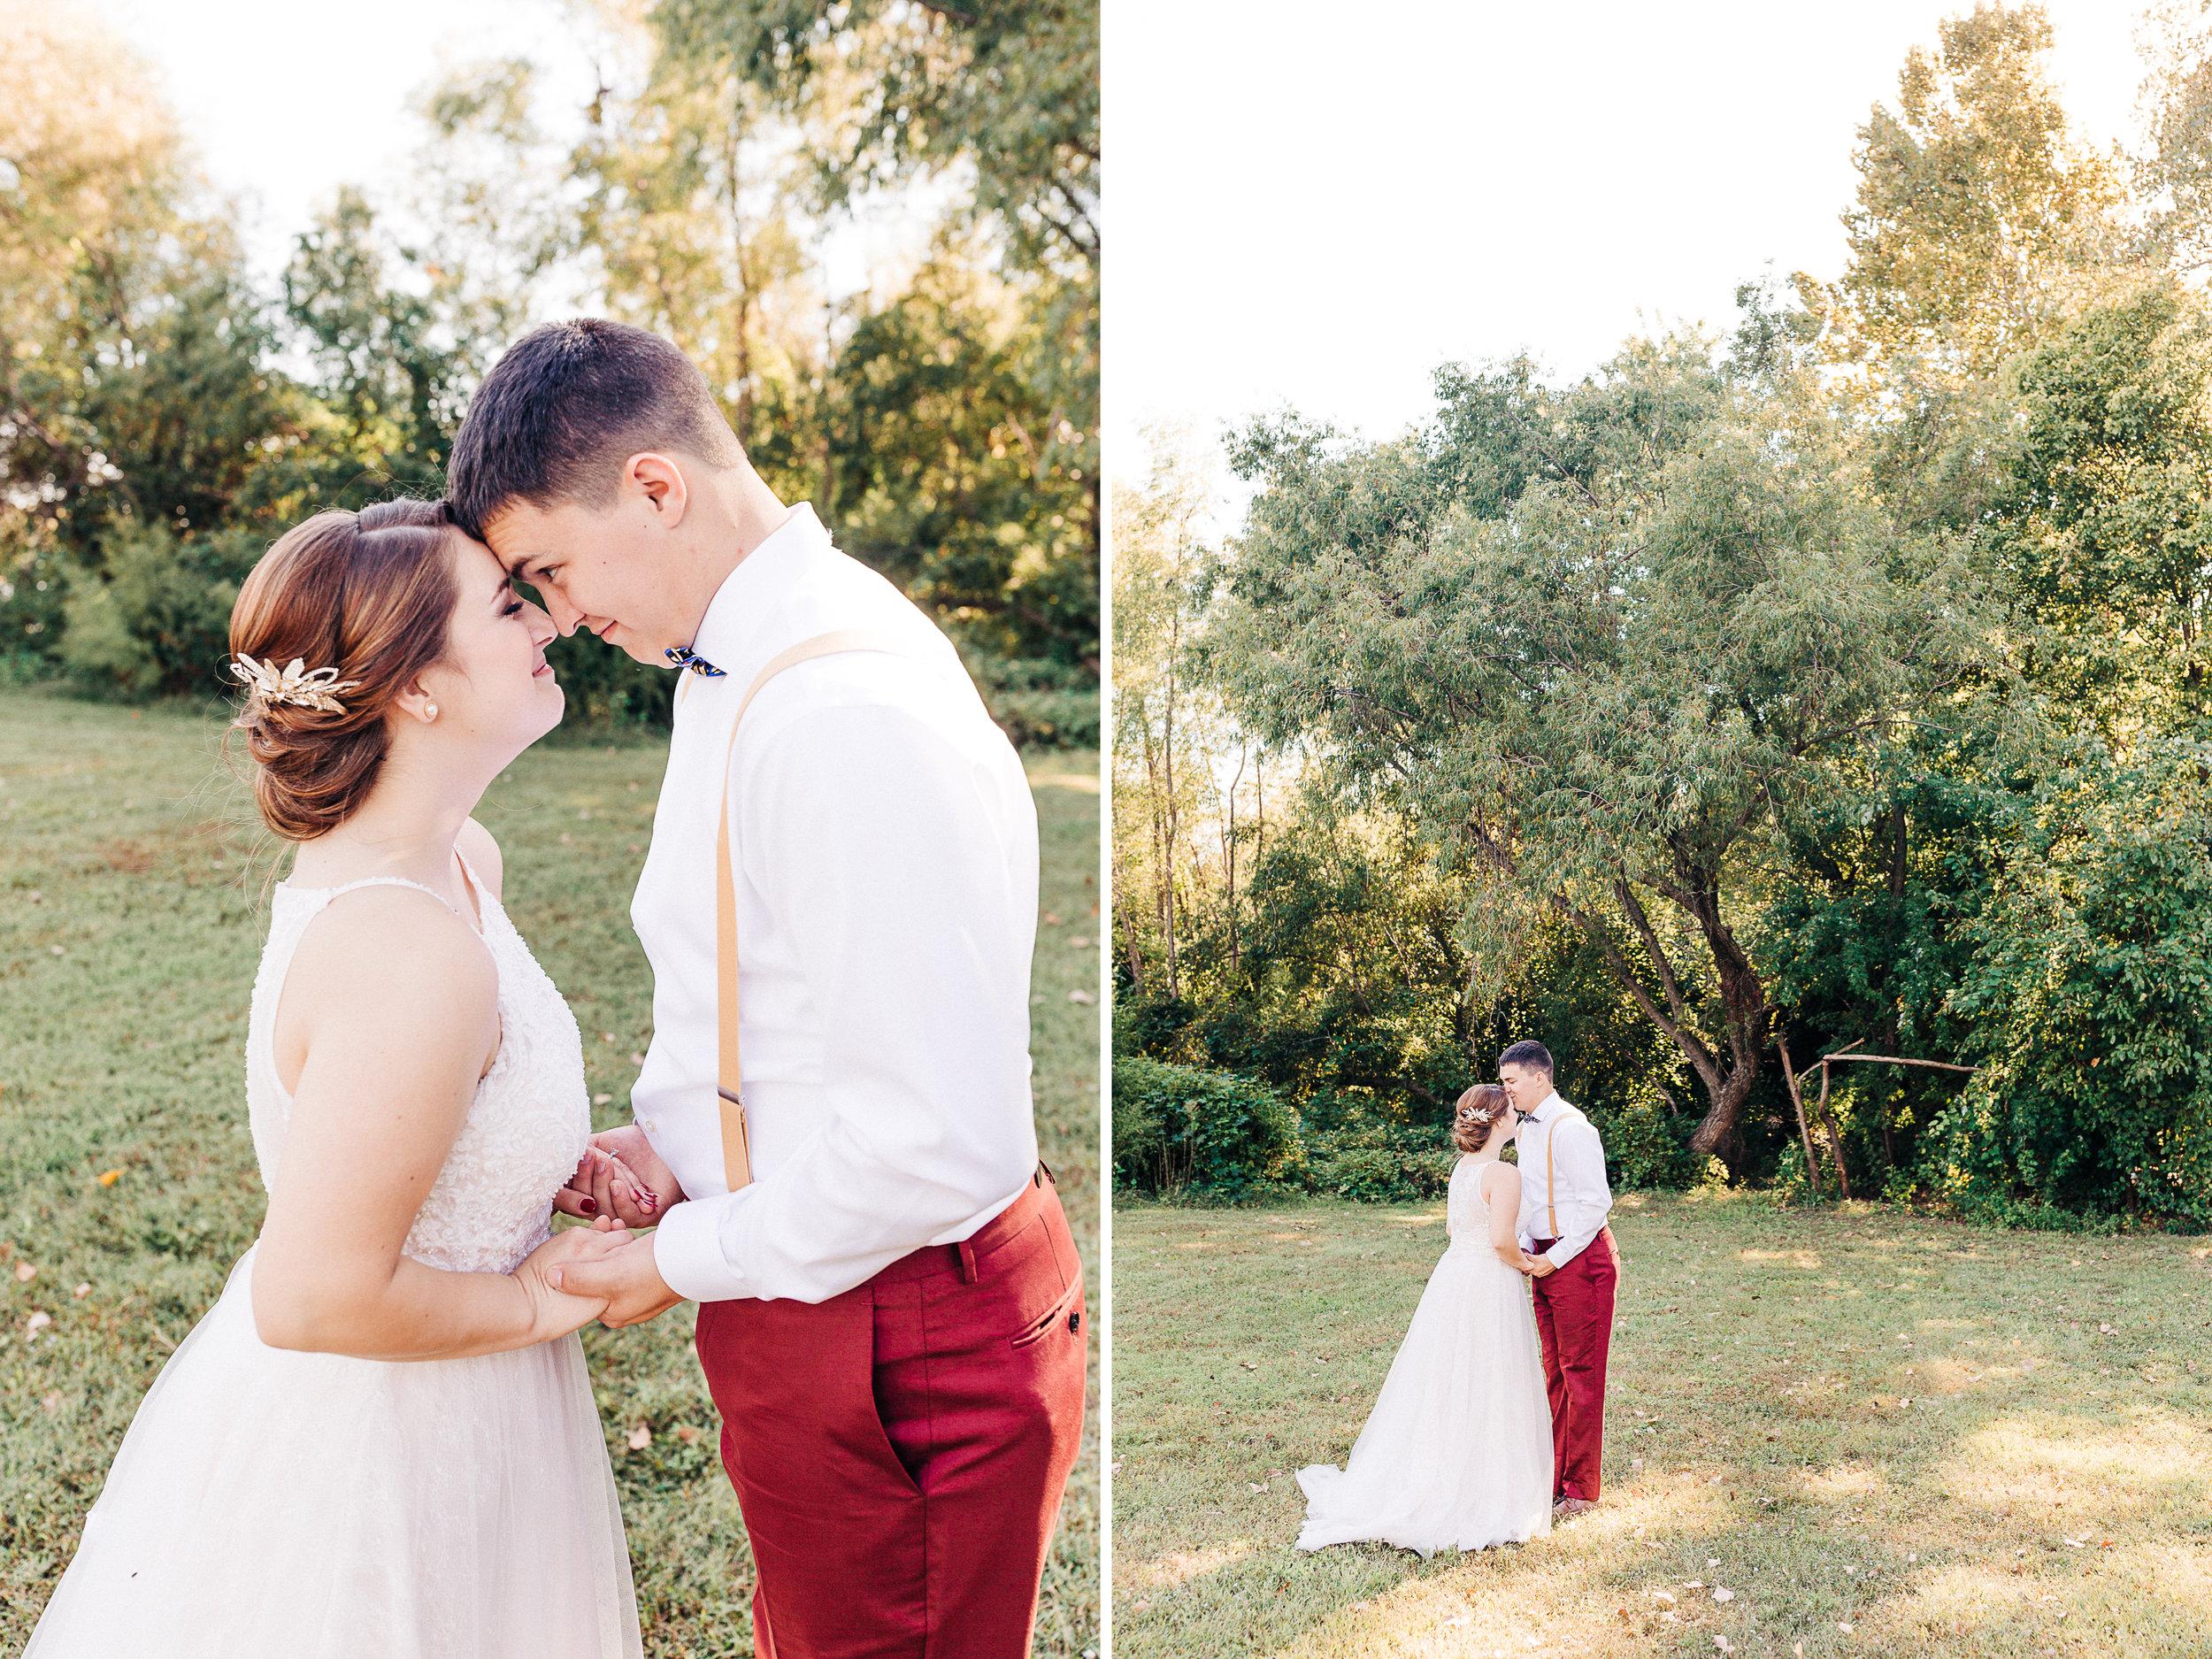 Dorothy_Louise_Photography_Eric_Fallon_La-Belle_Coeur_Main_Street_St_Charles_Wedding_Collage4.jpg